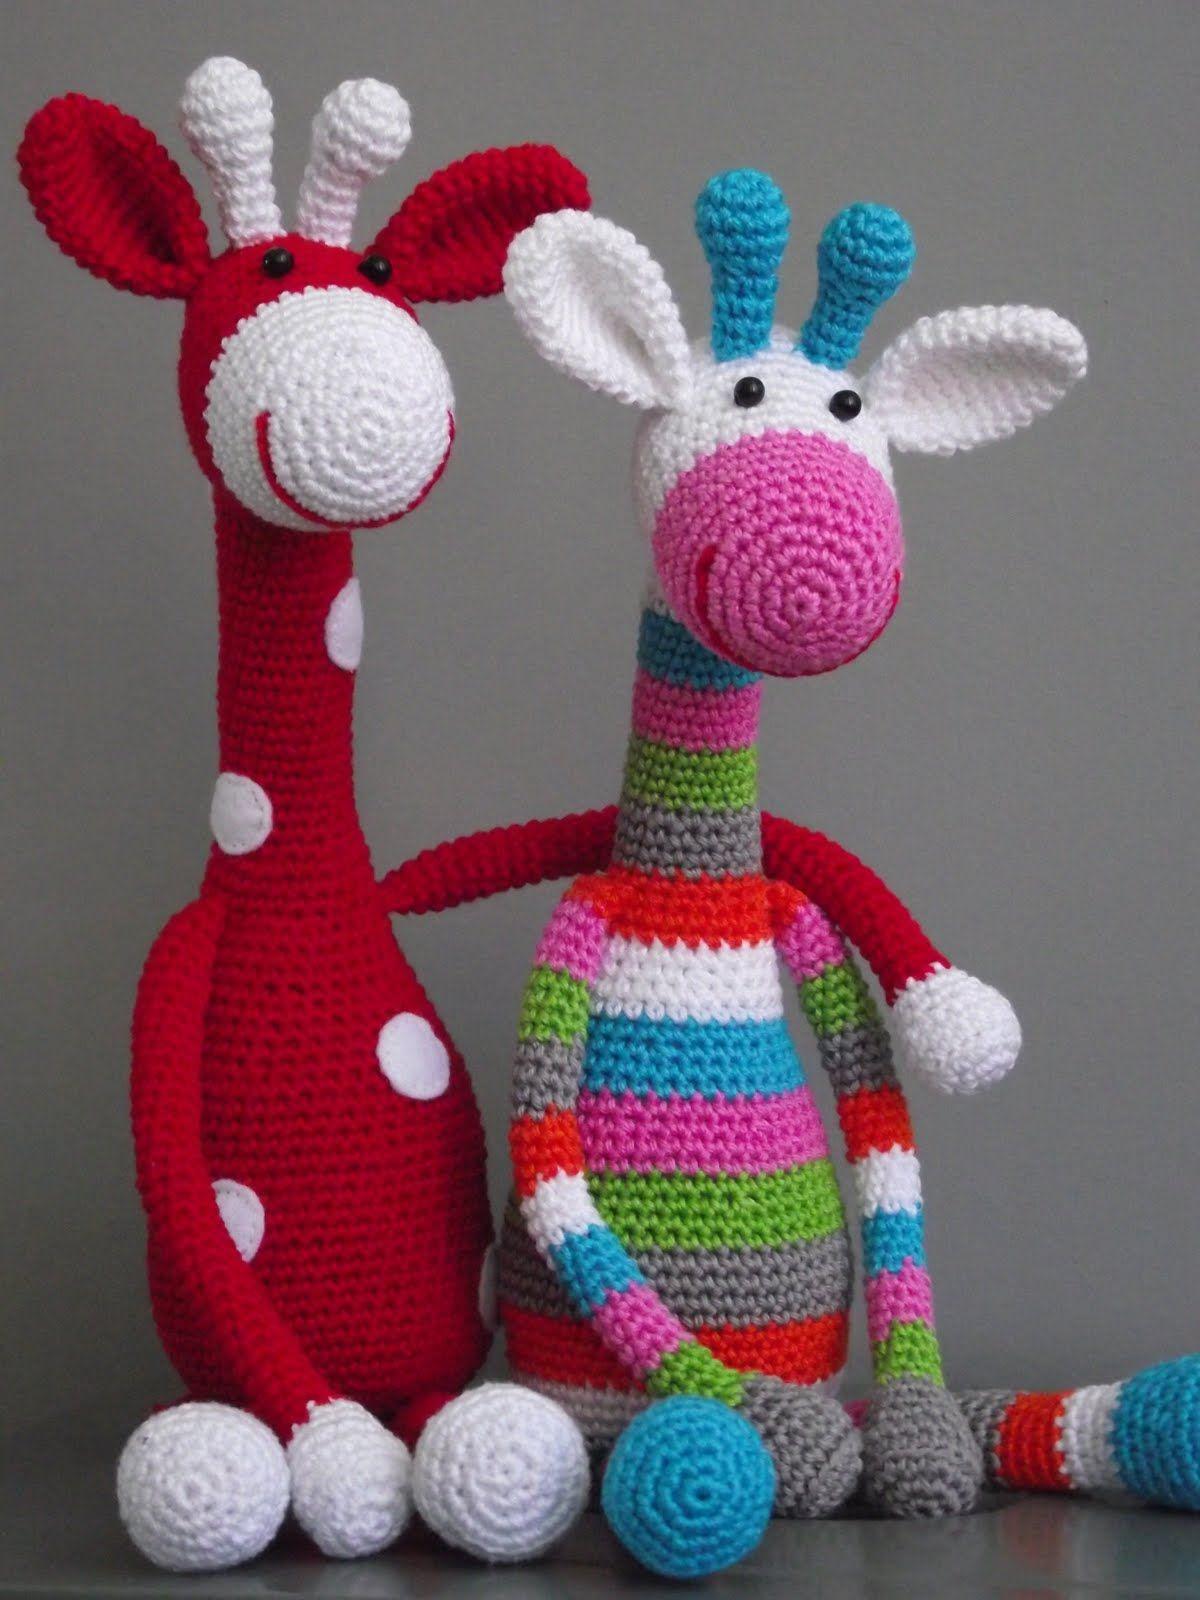 Girafa amigurumi- girafa crochê (com imagens)   Girafa, Amigurumi ...   1600x1200